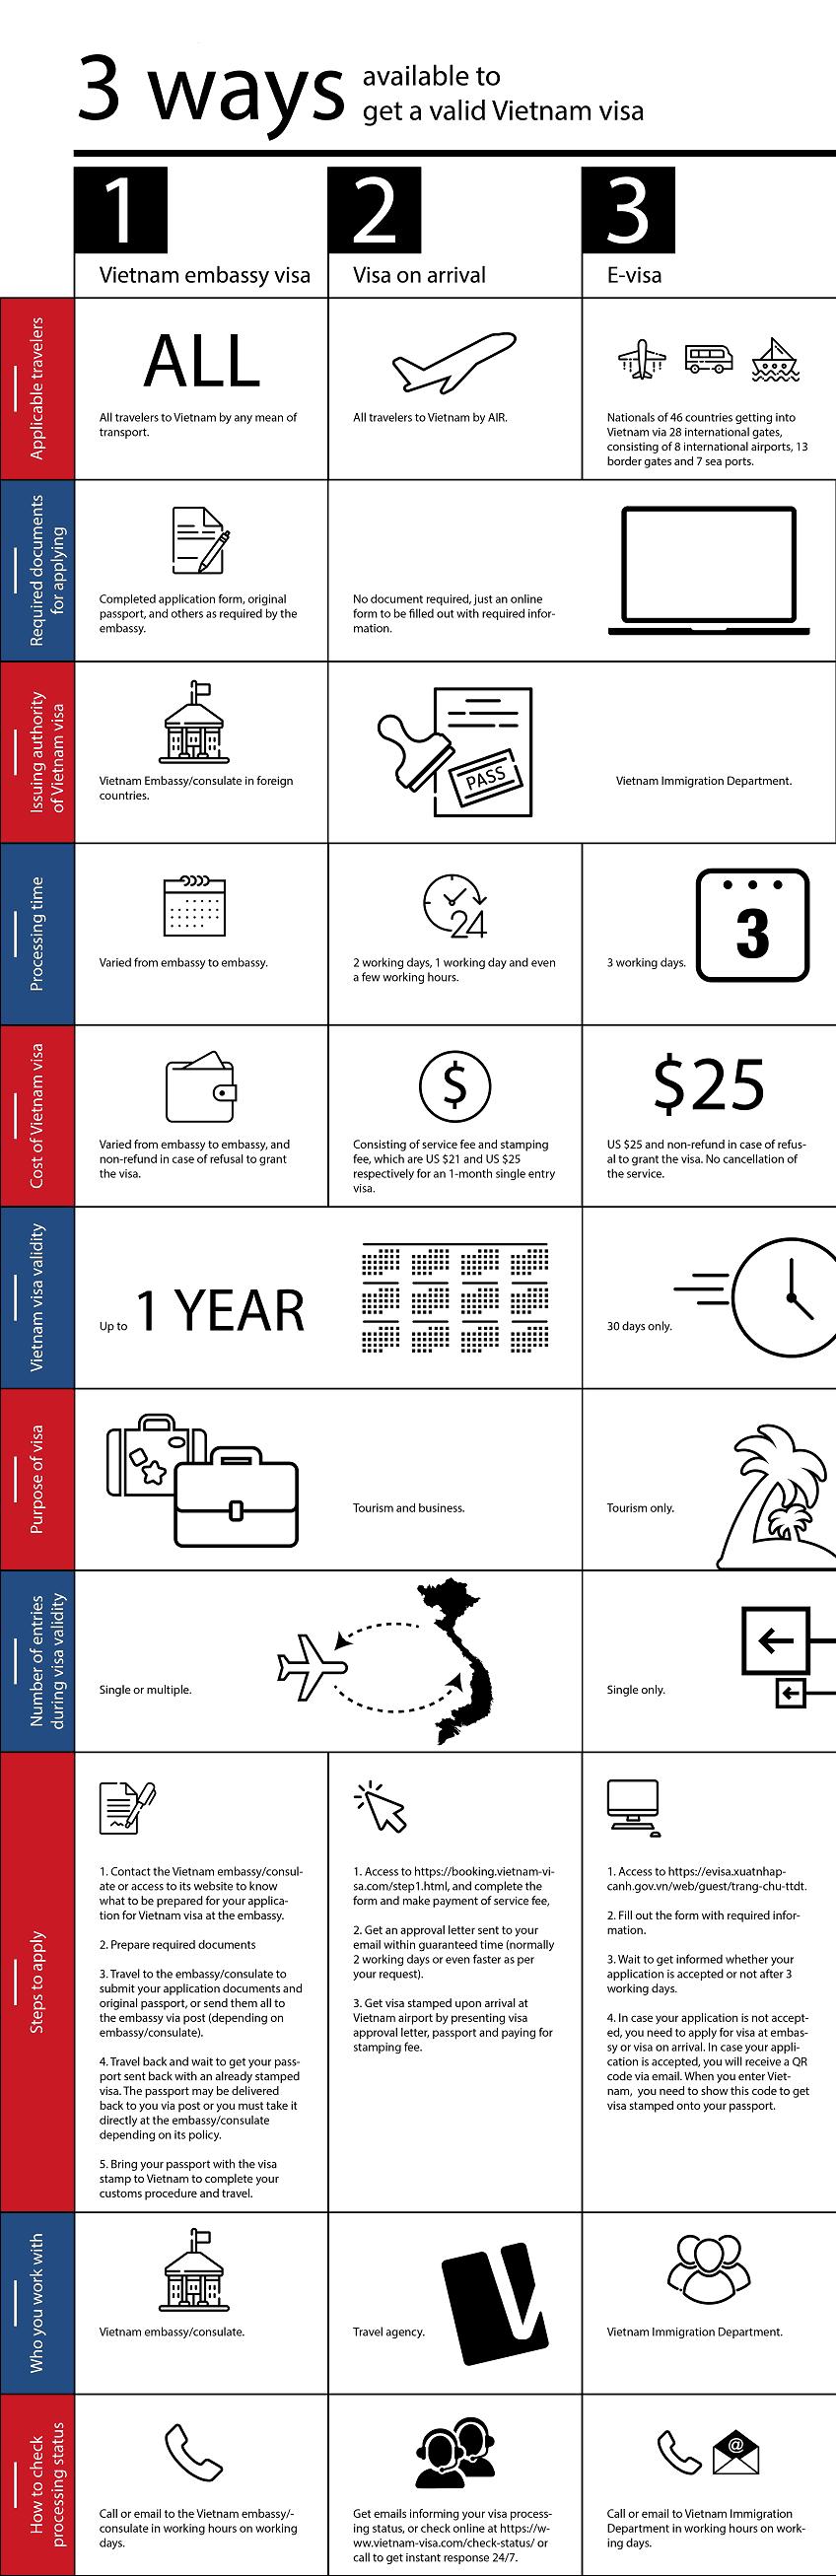 3 ways to get Vietnam visa currently